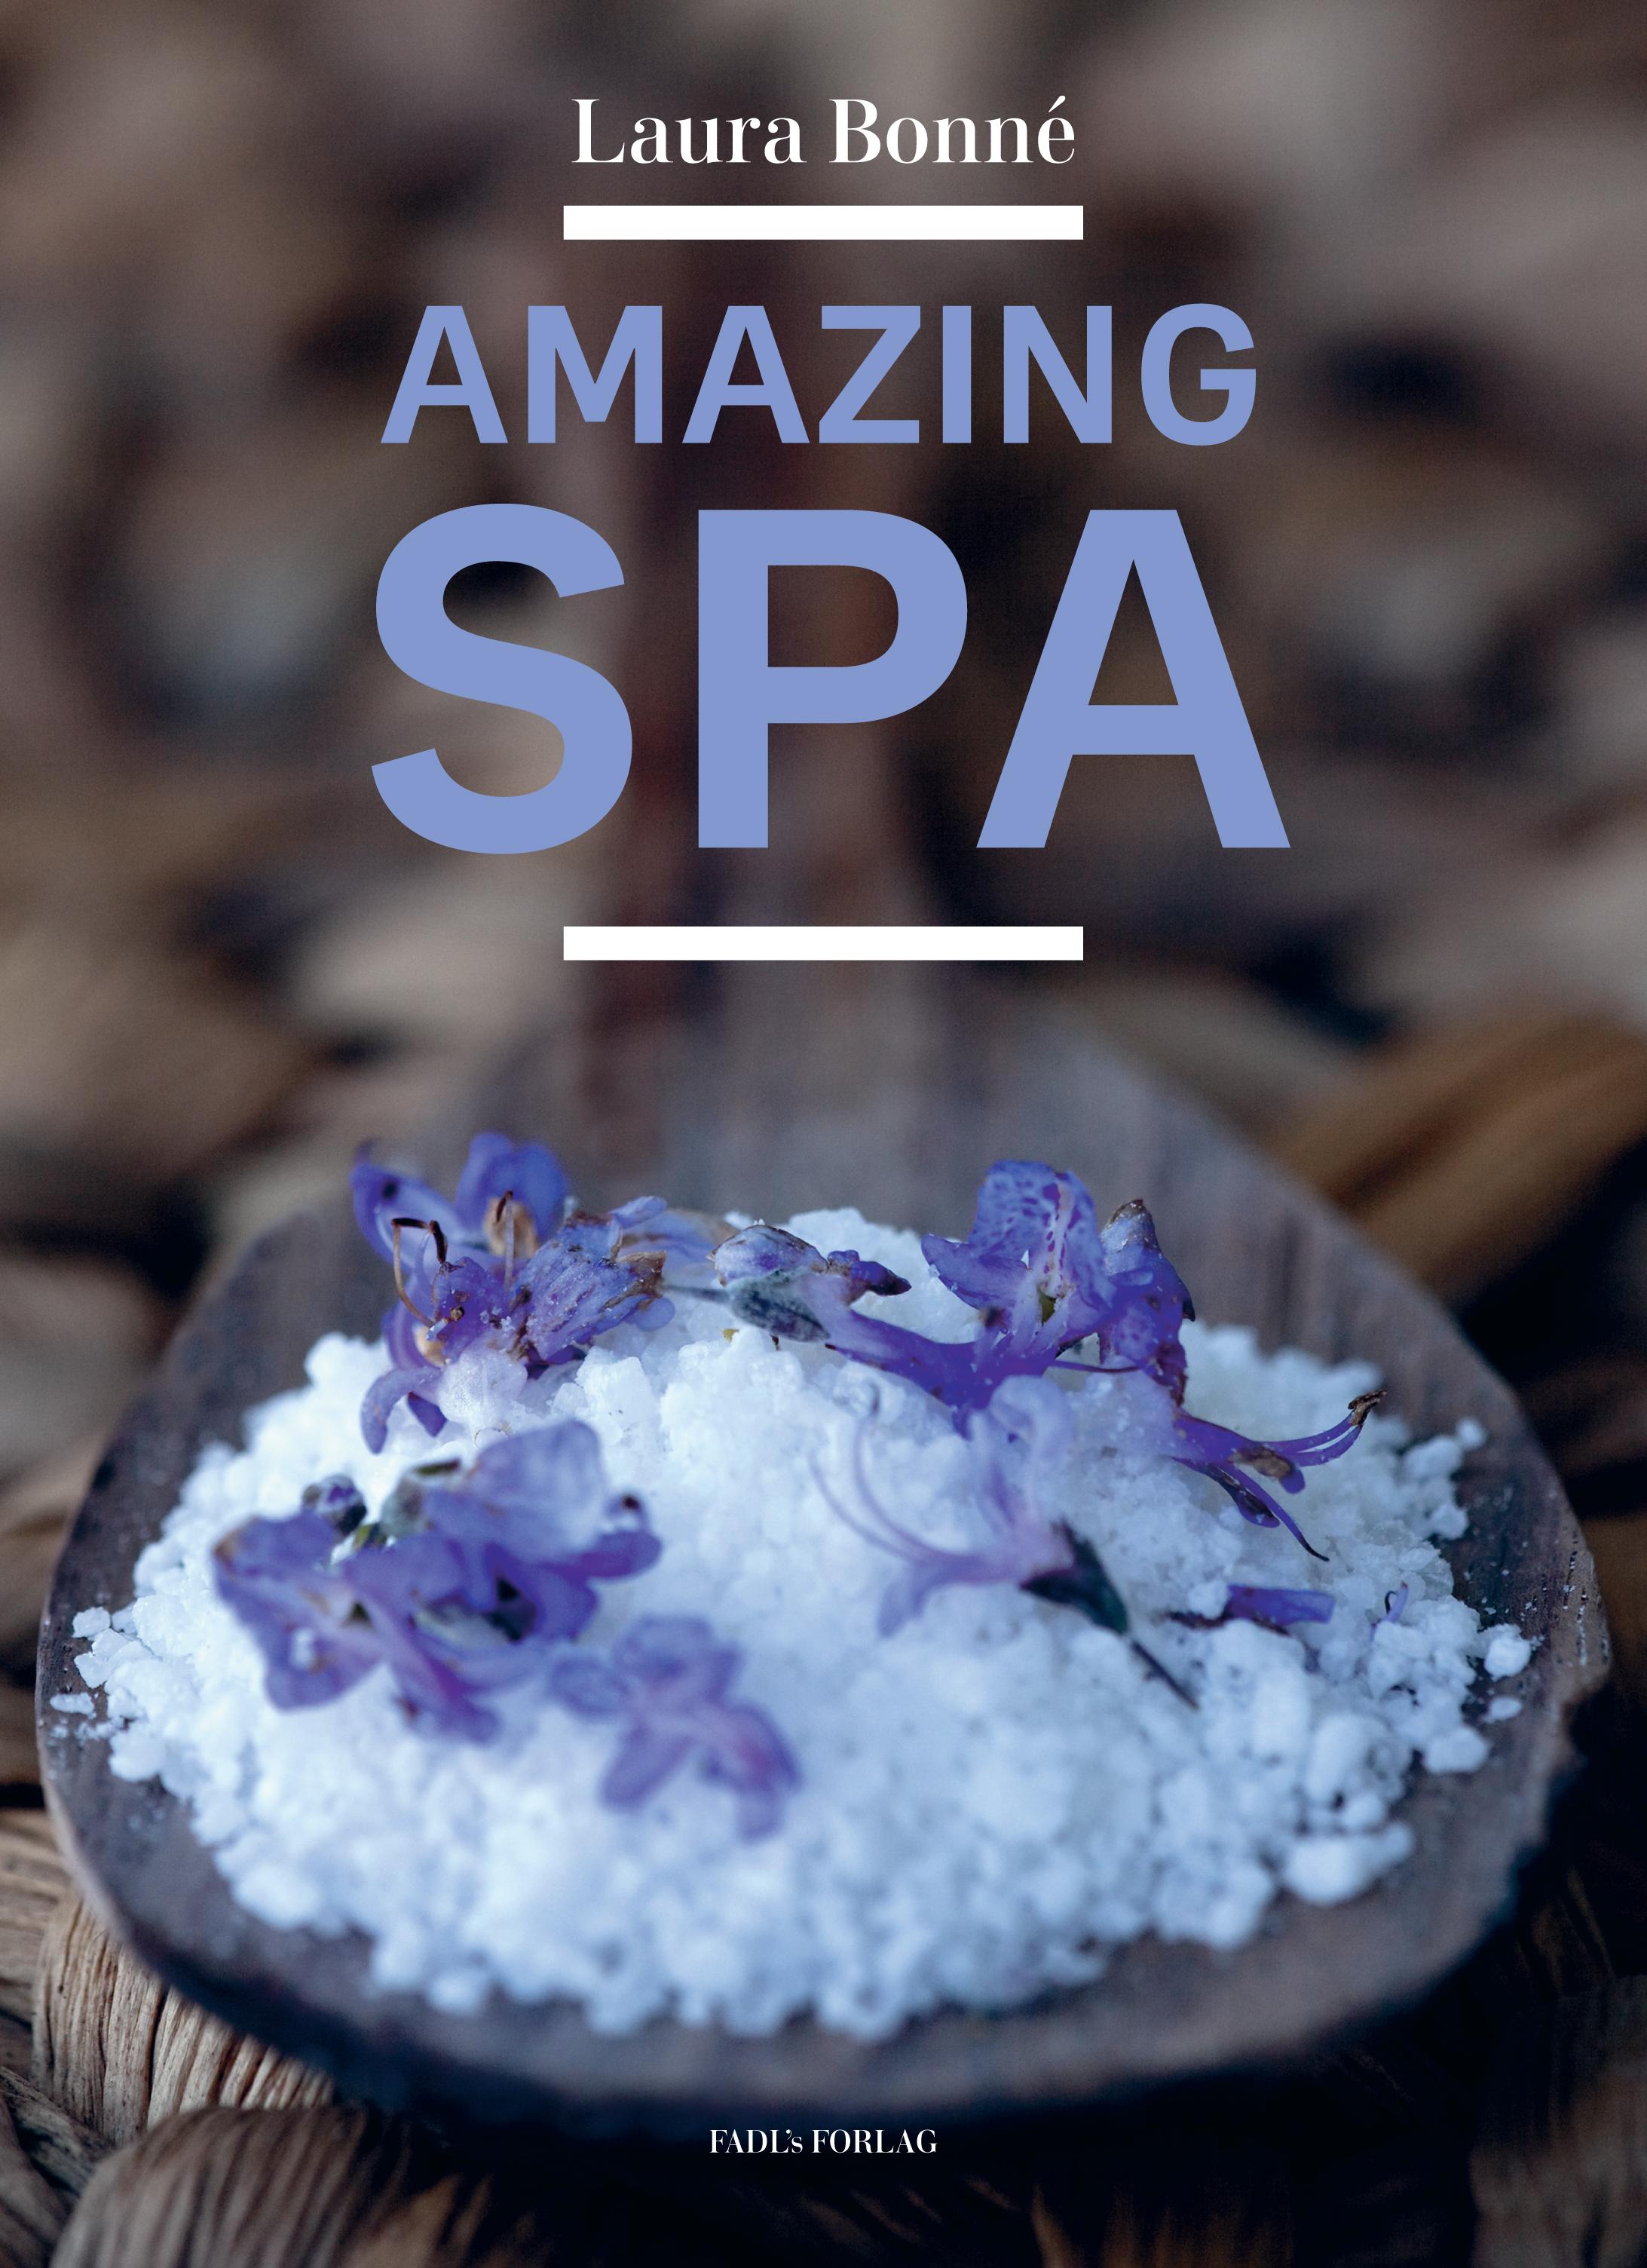 Amazing spa